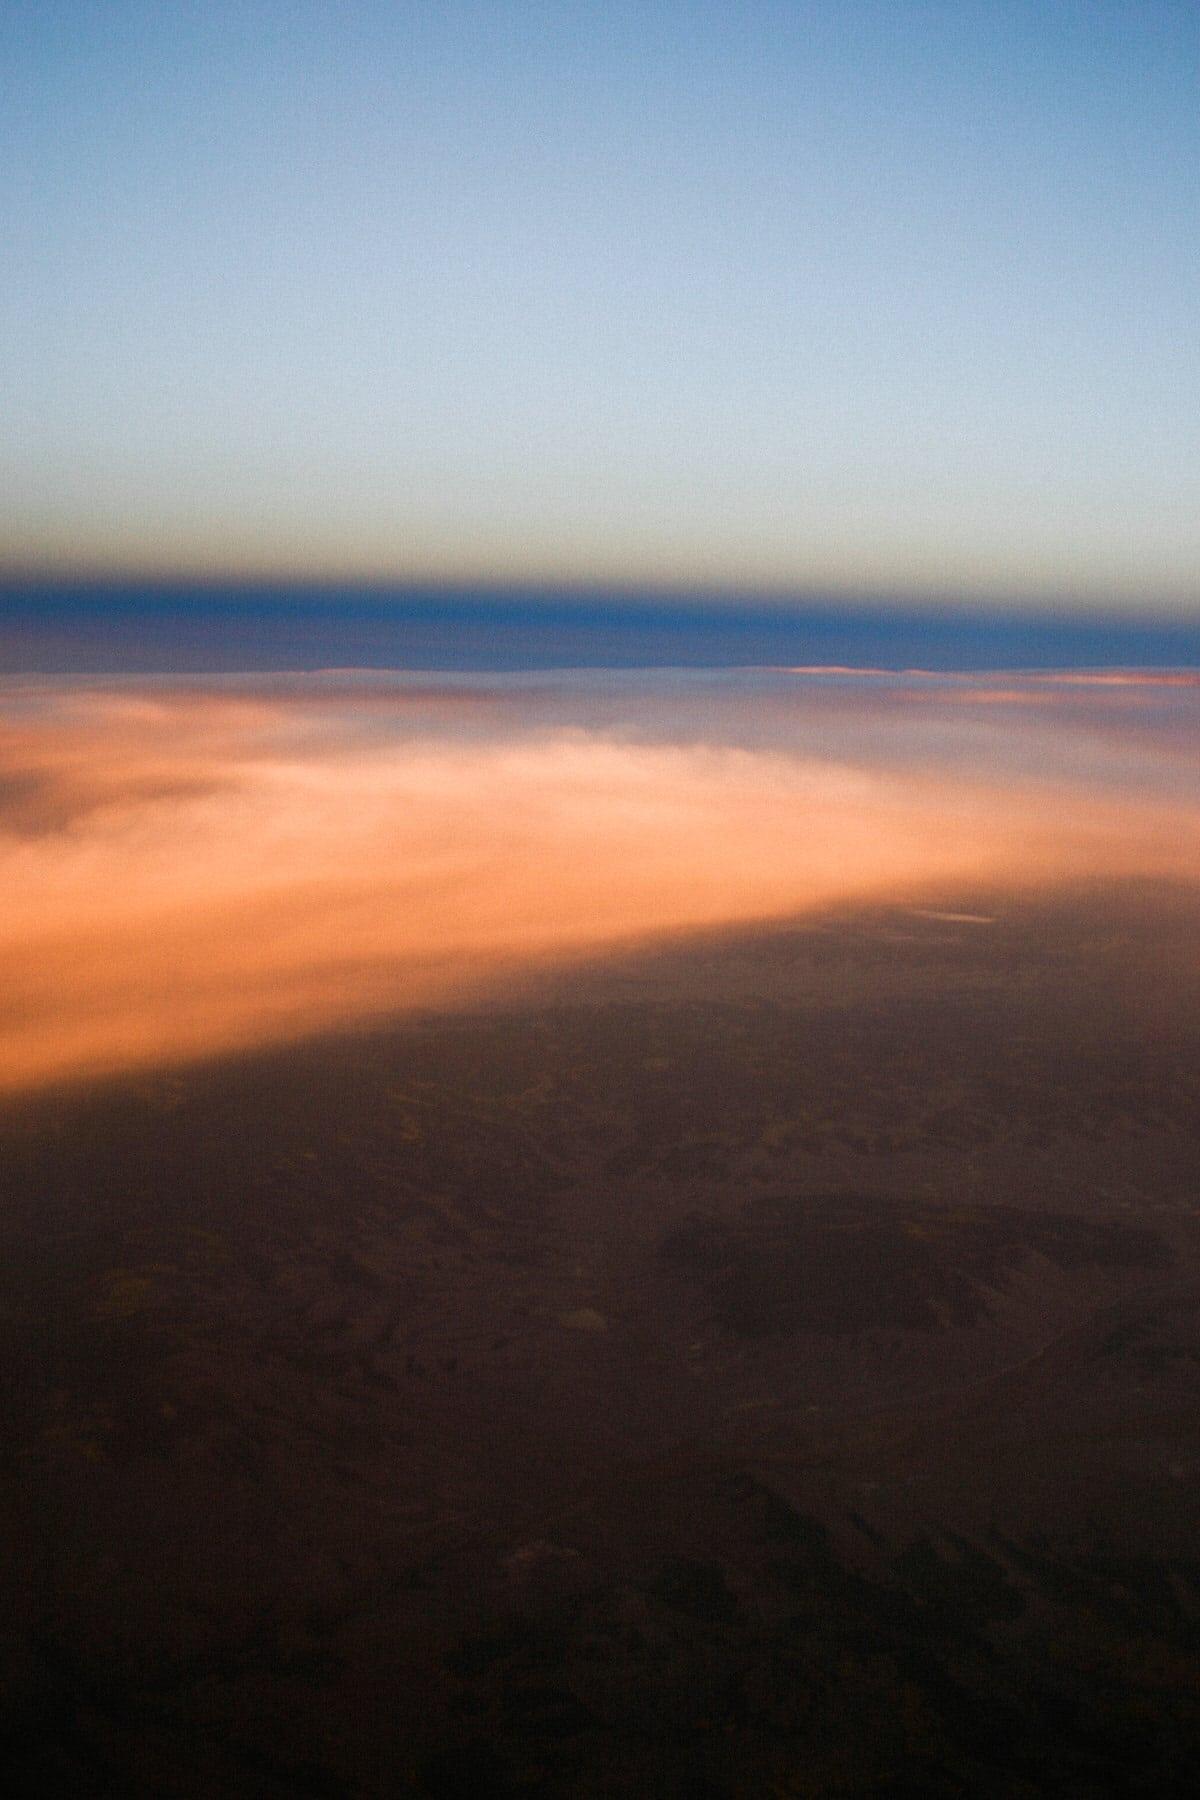 Grand-Canyon-Arizona-black-and-white-fine-art-photography-by-Studio-L-photographer-Laura-Schneider-_0730